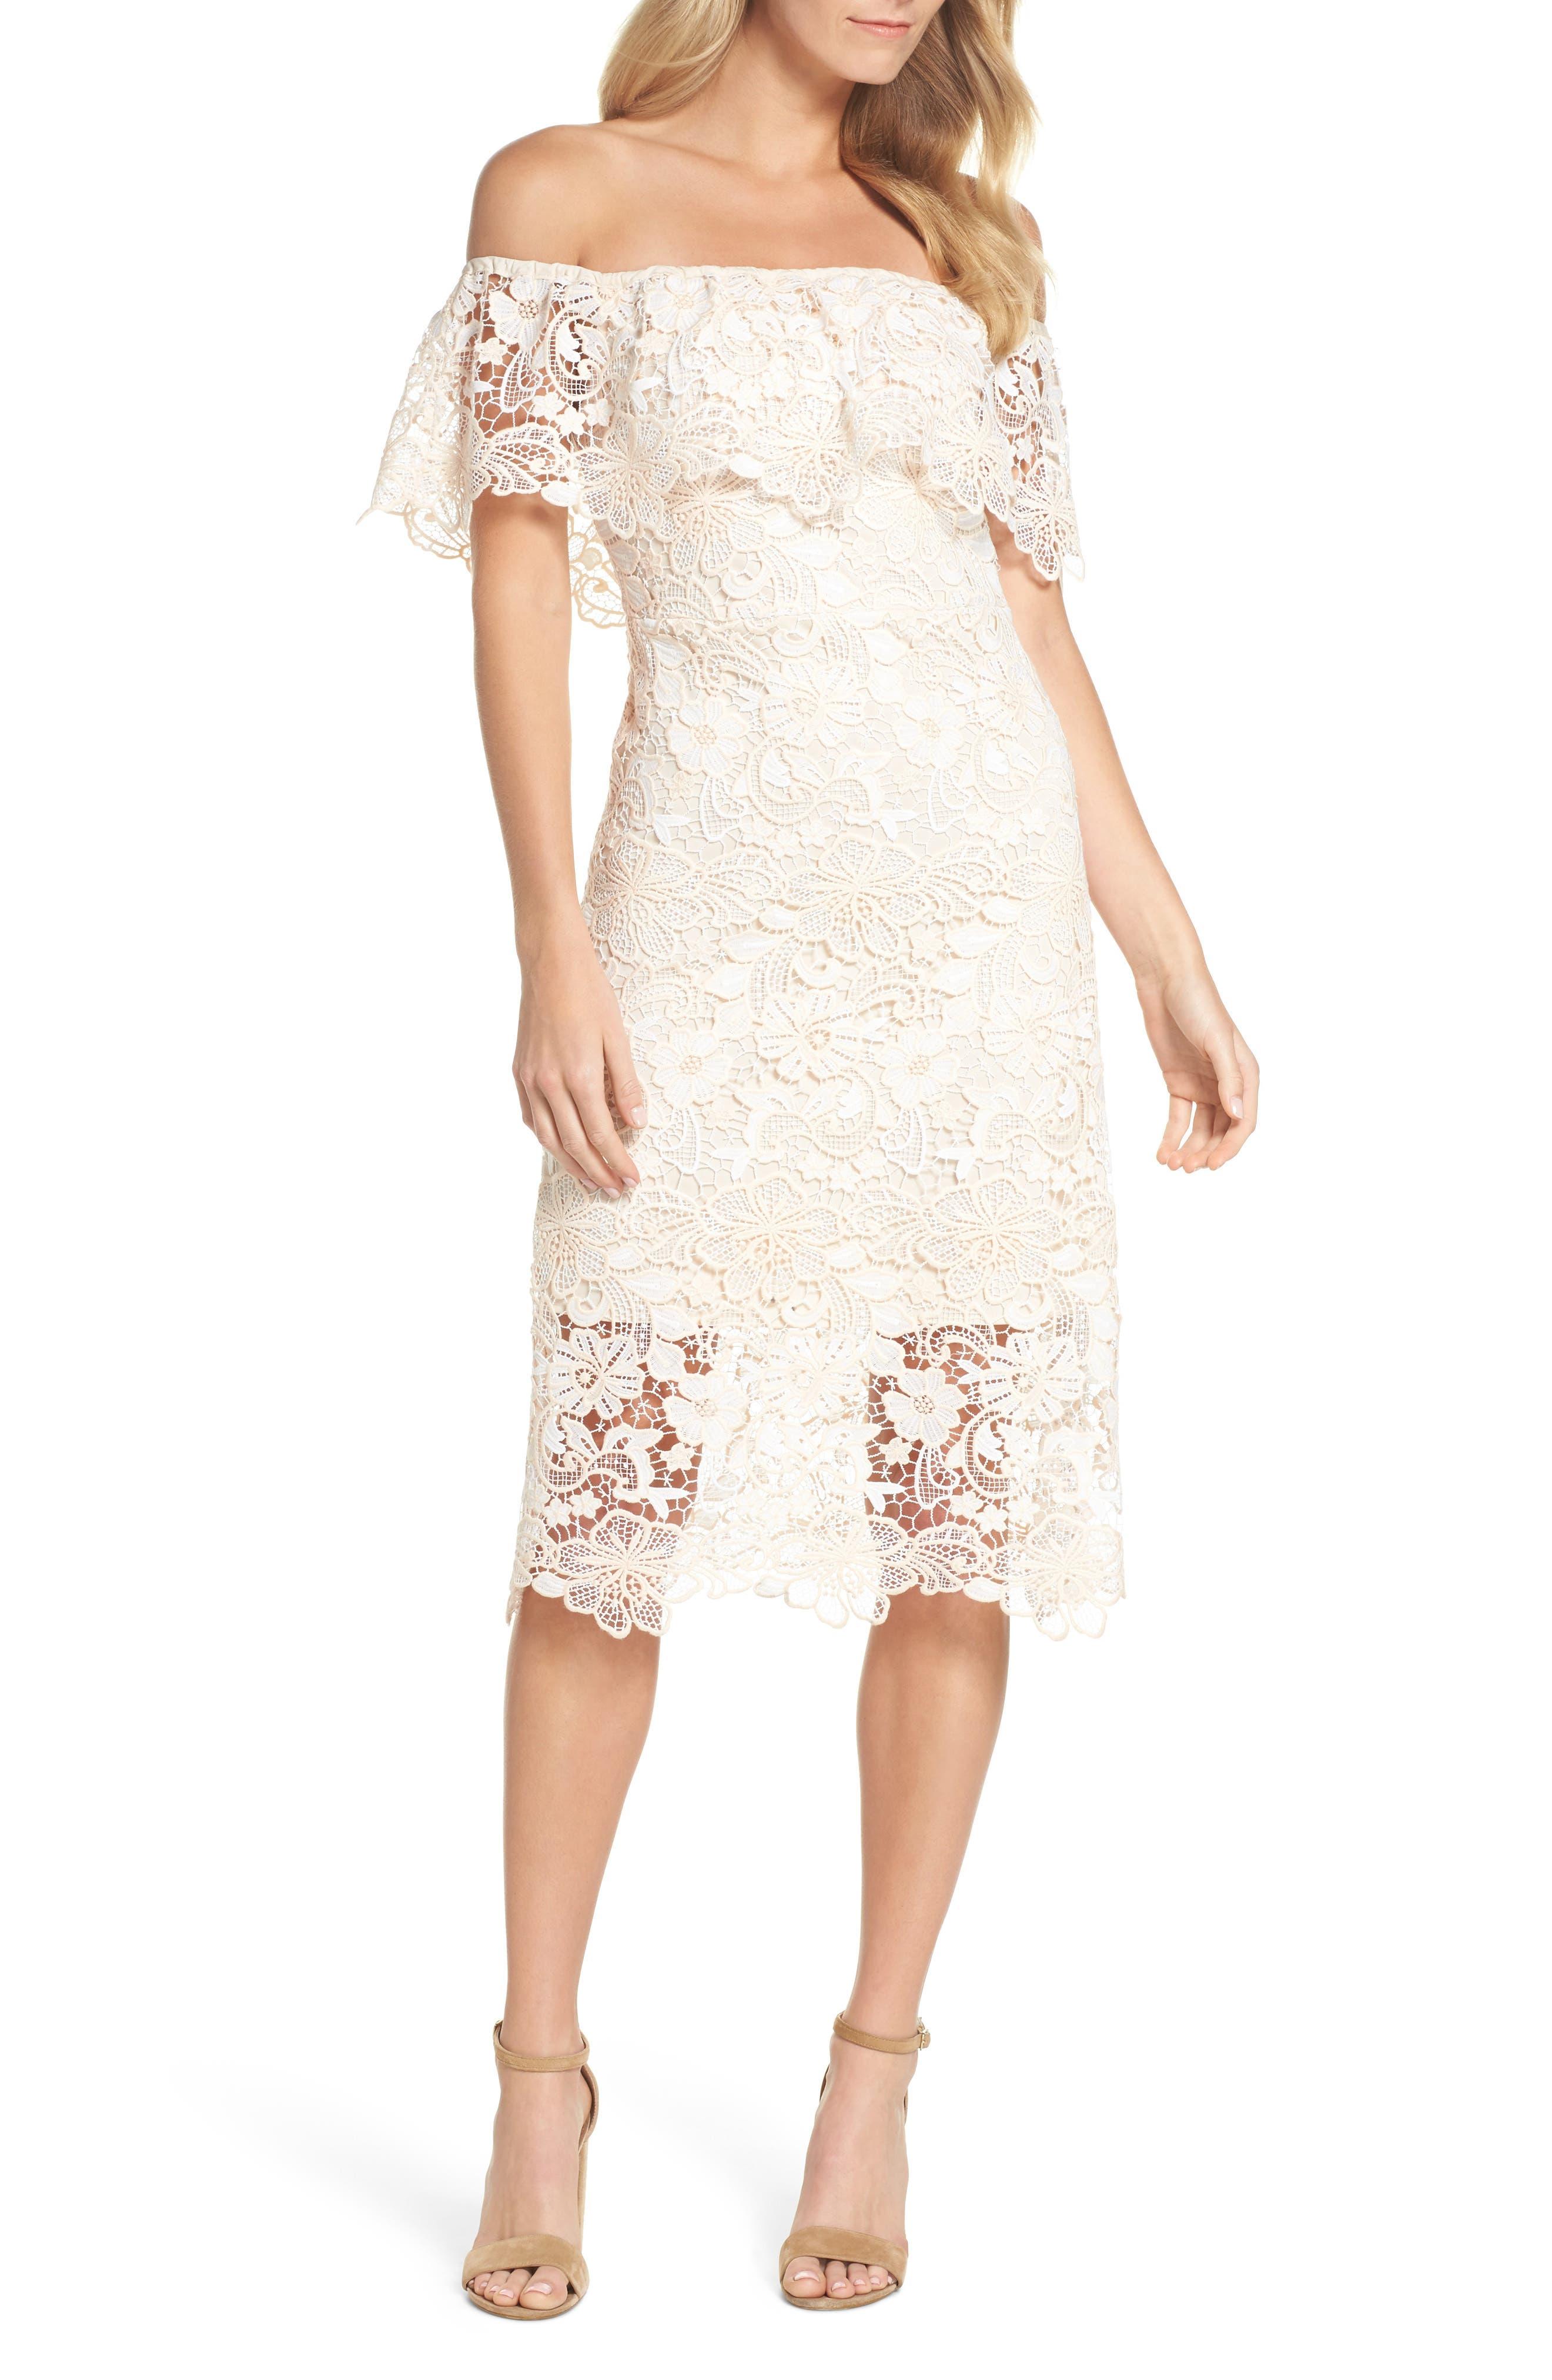 Chelsea28 Off the Shoulder Lace Midi Dress